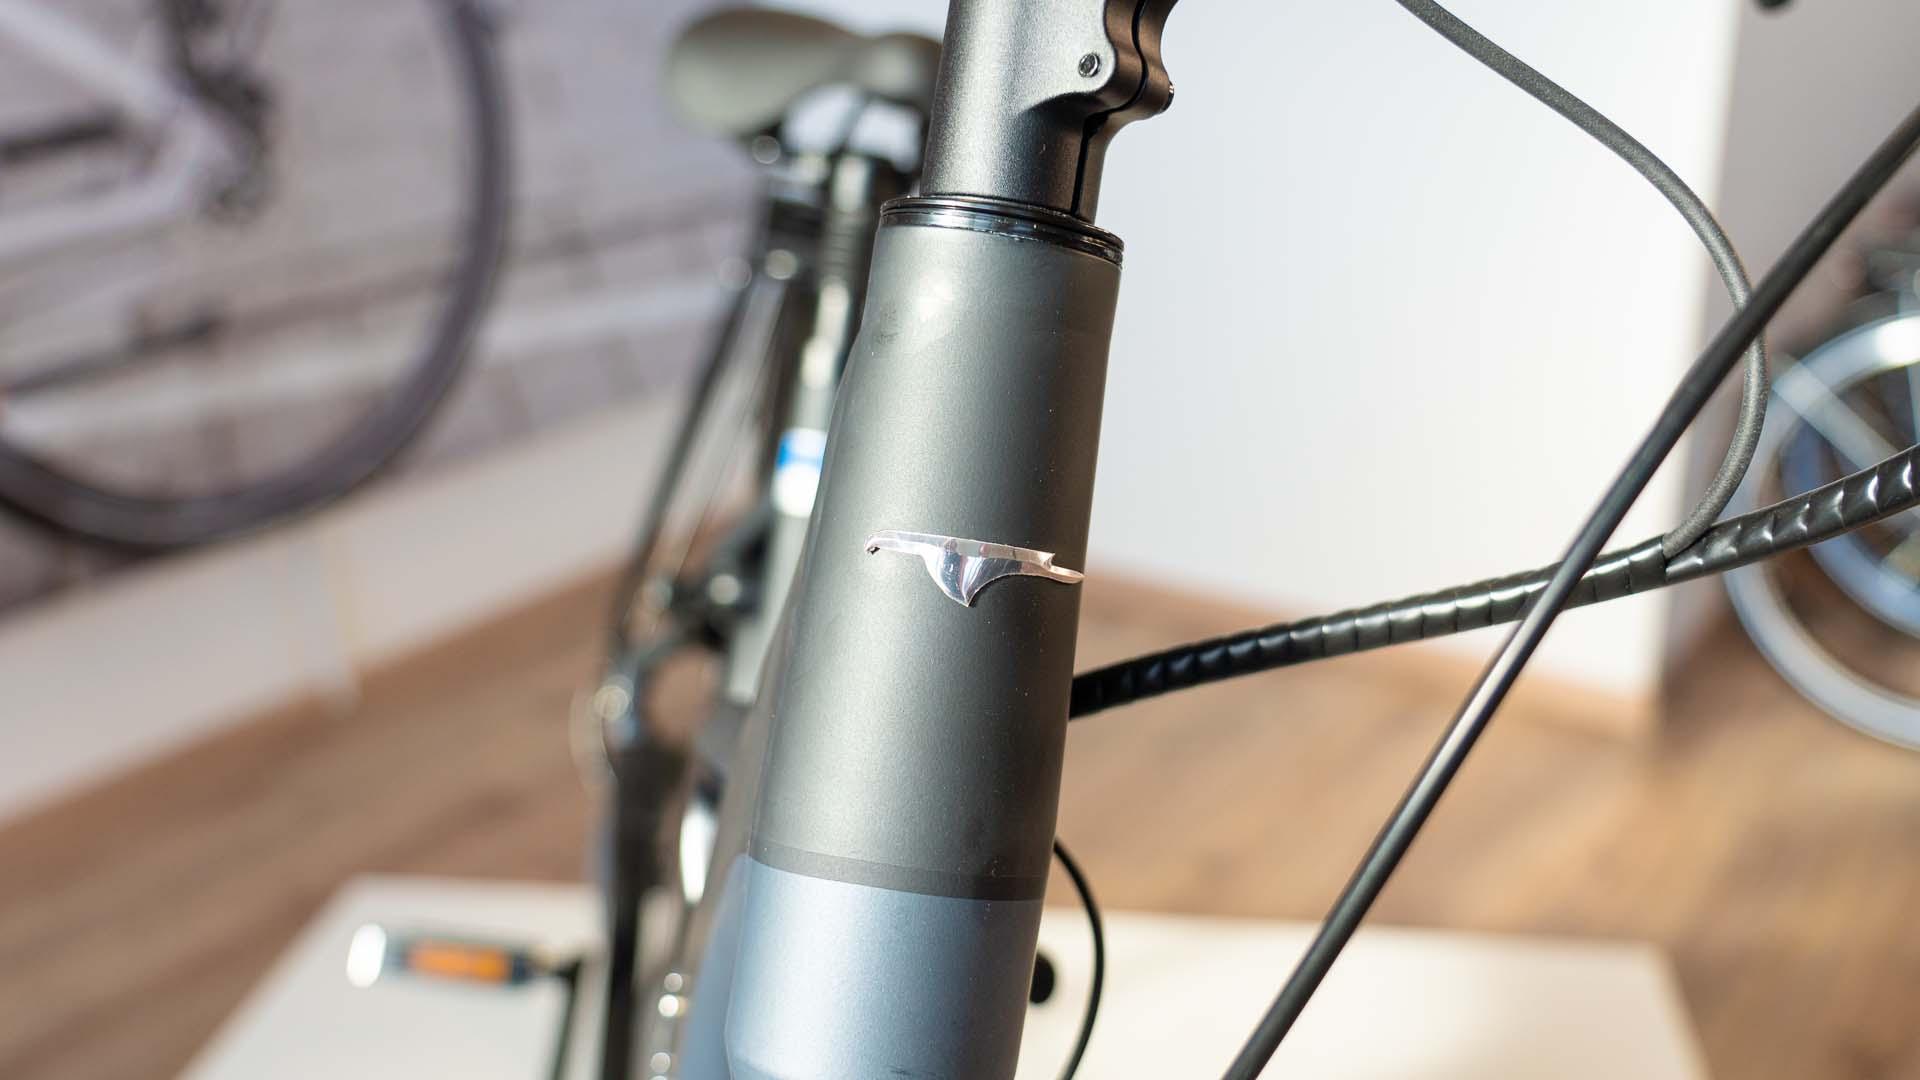 Fahrradzentrum Grauthoff Fotoshooting 10